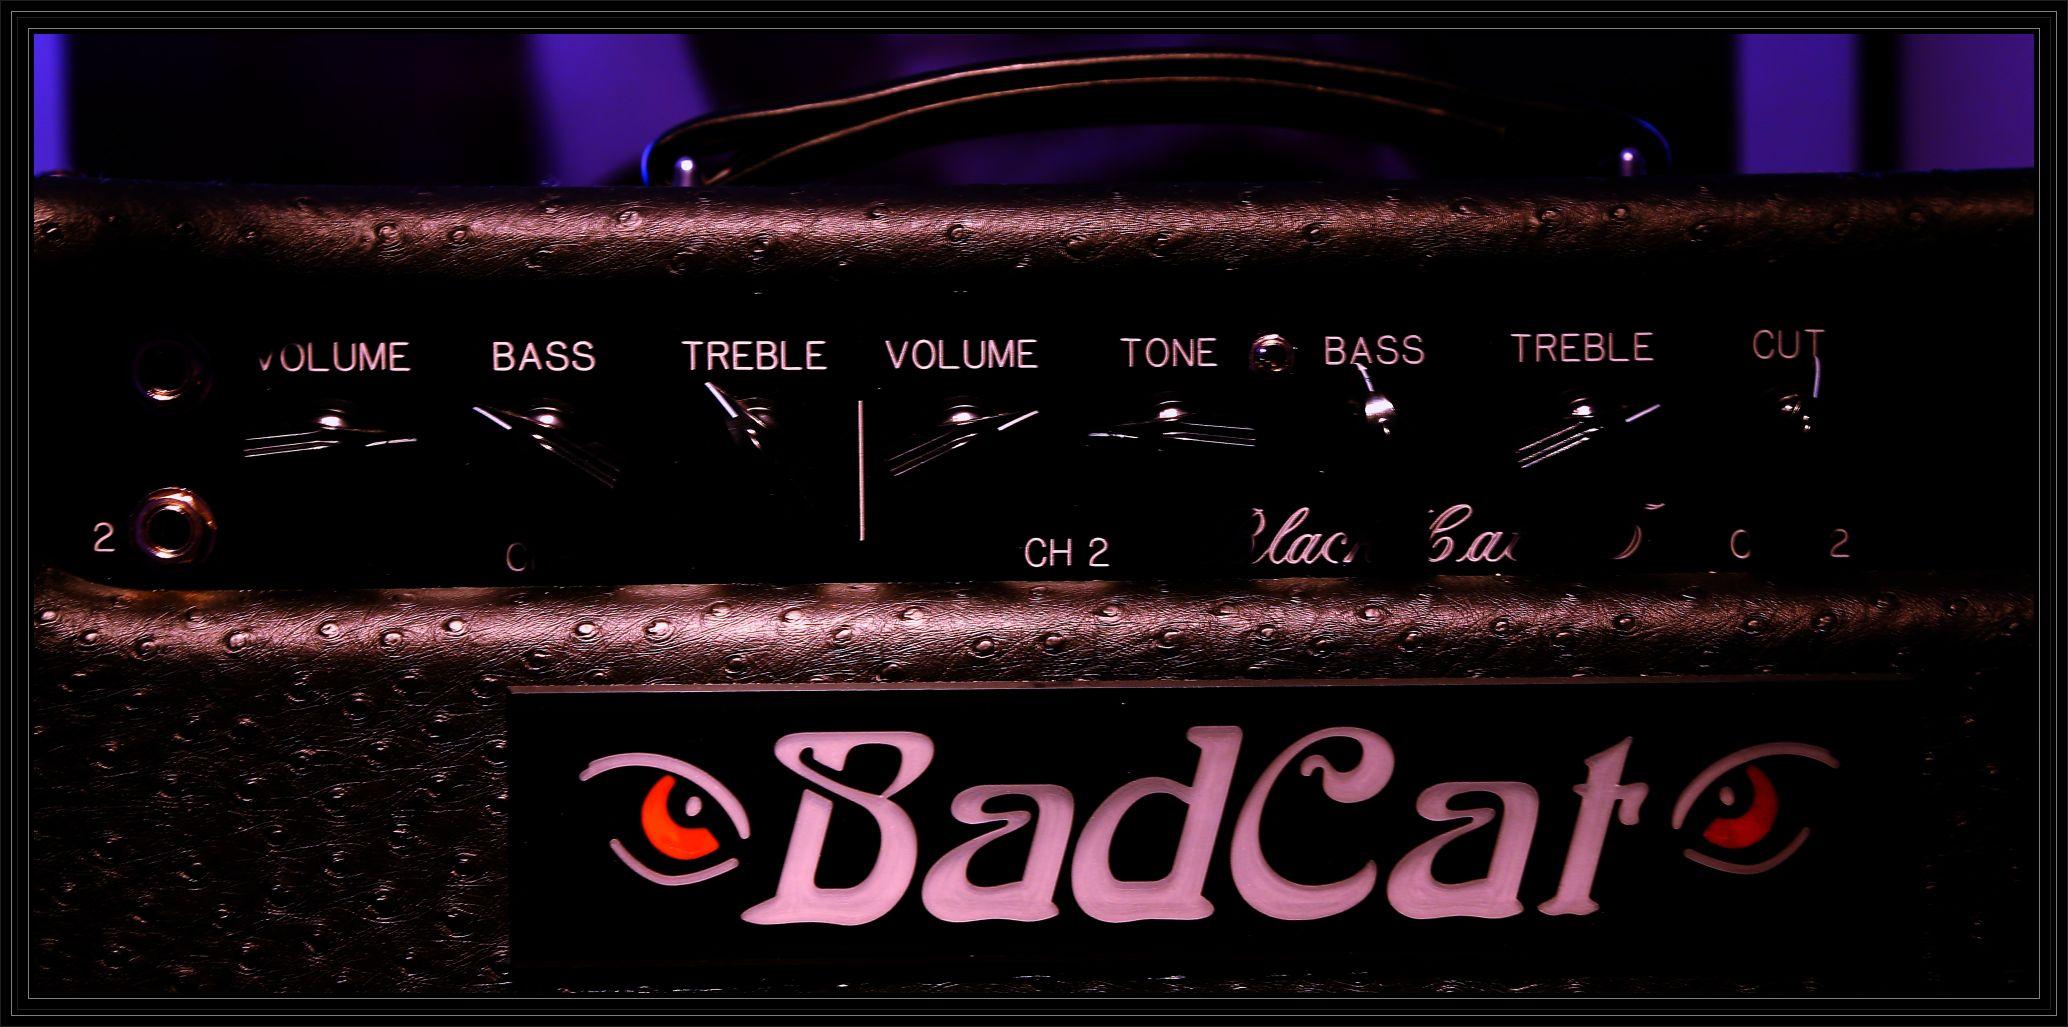 Black Cat 15 Combo